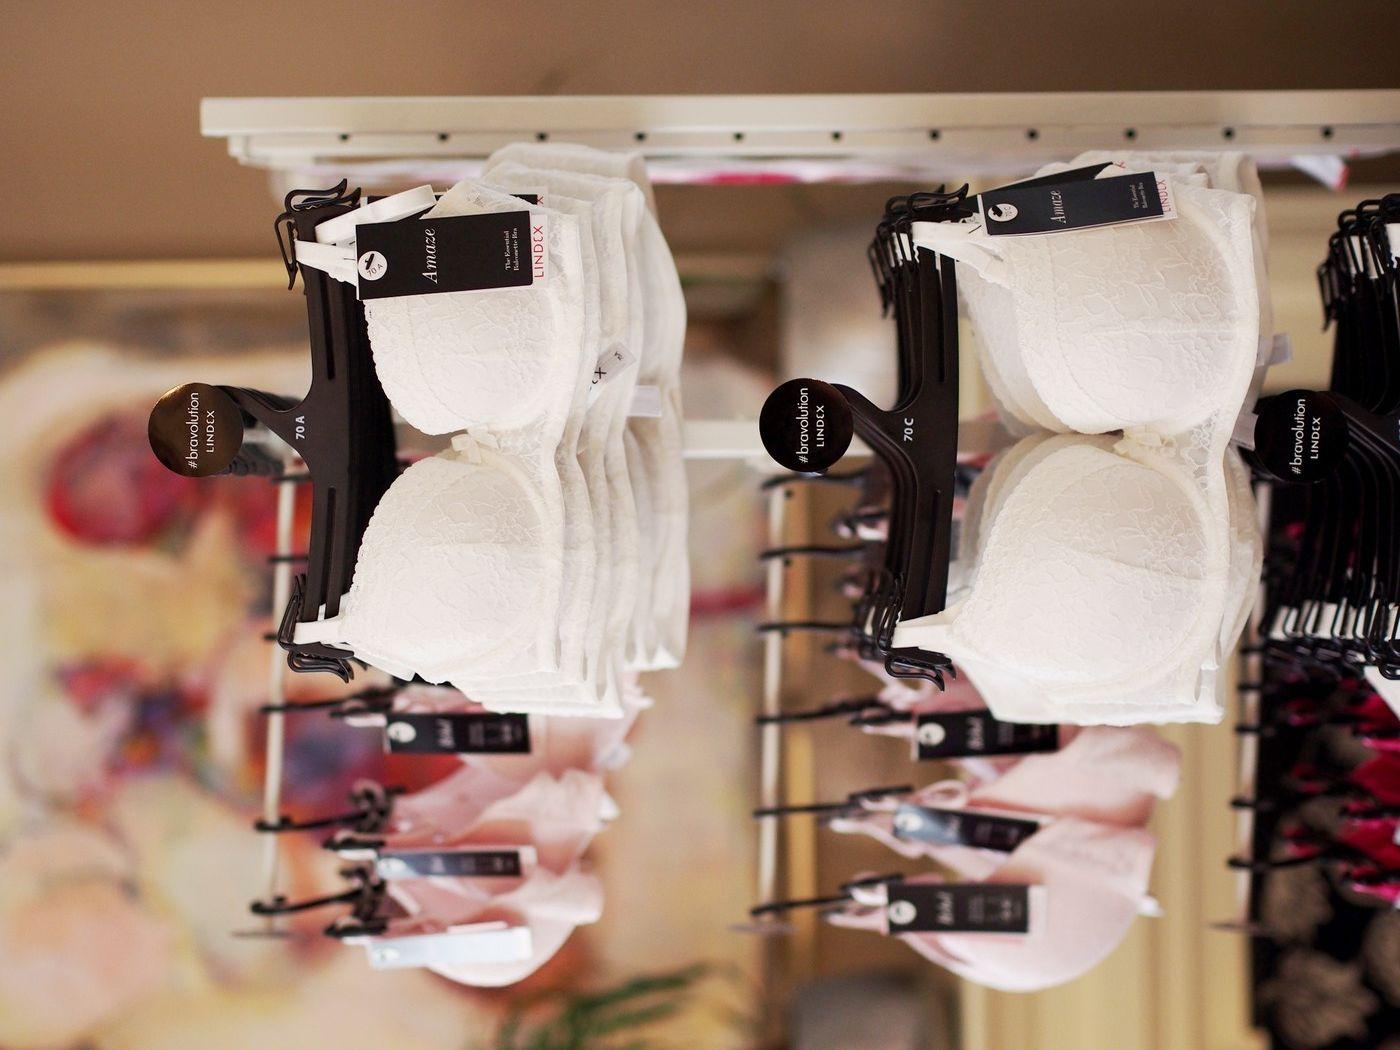 Olkaimettomat rintaliivit lindex